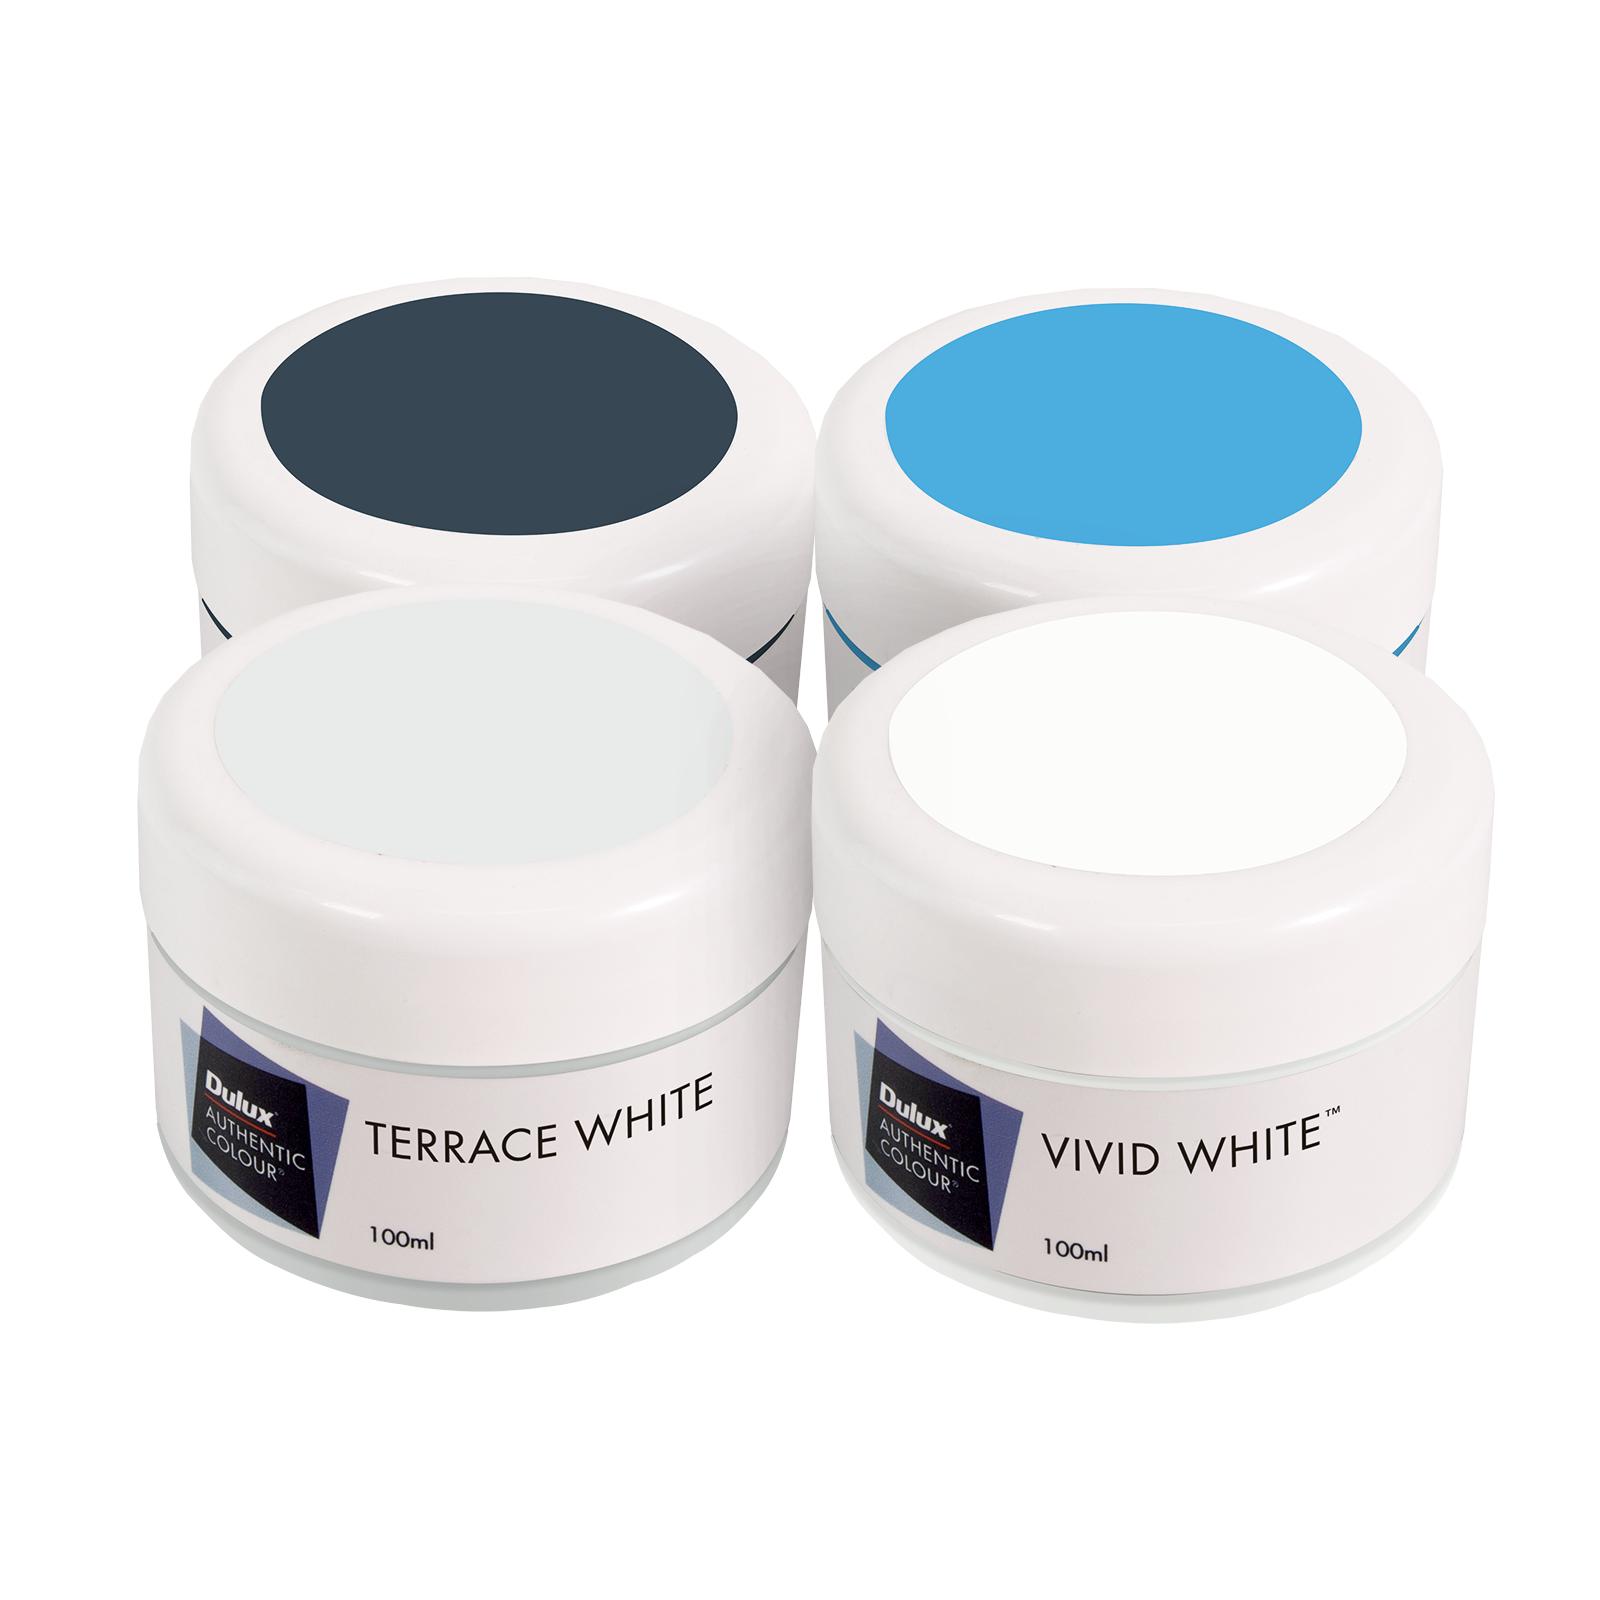 Dulux 100ml Terrace White Scheme External Sample Pot - 4 Pack